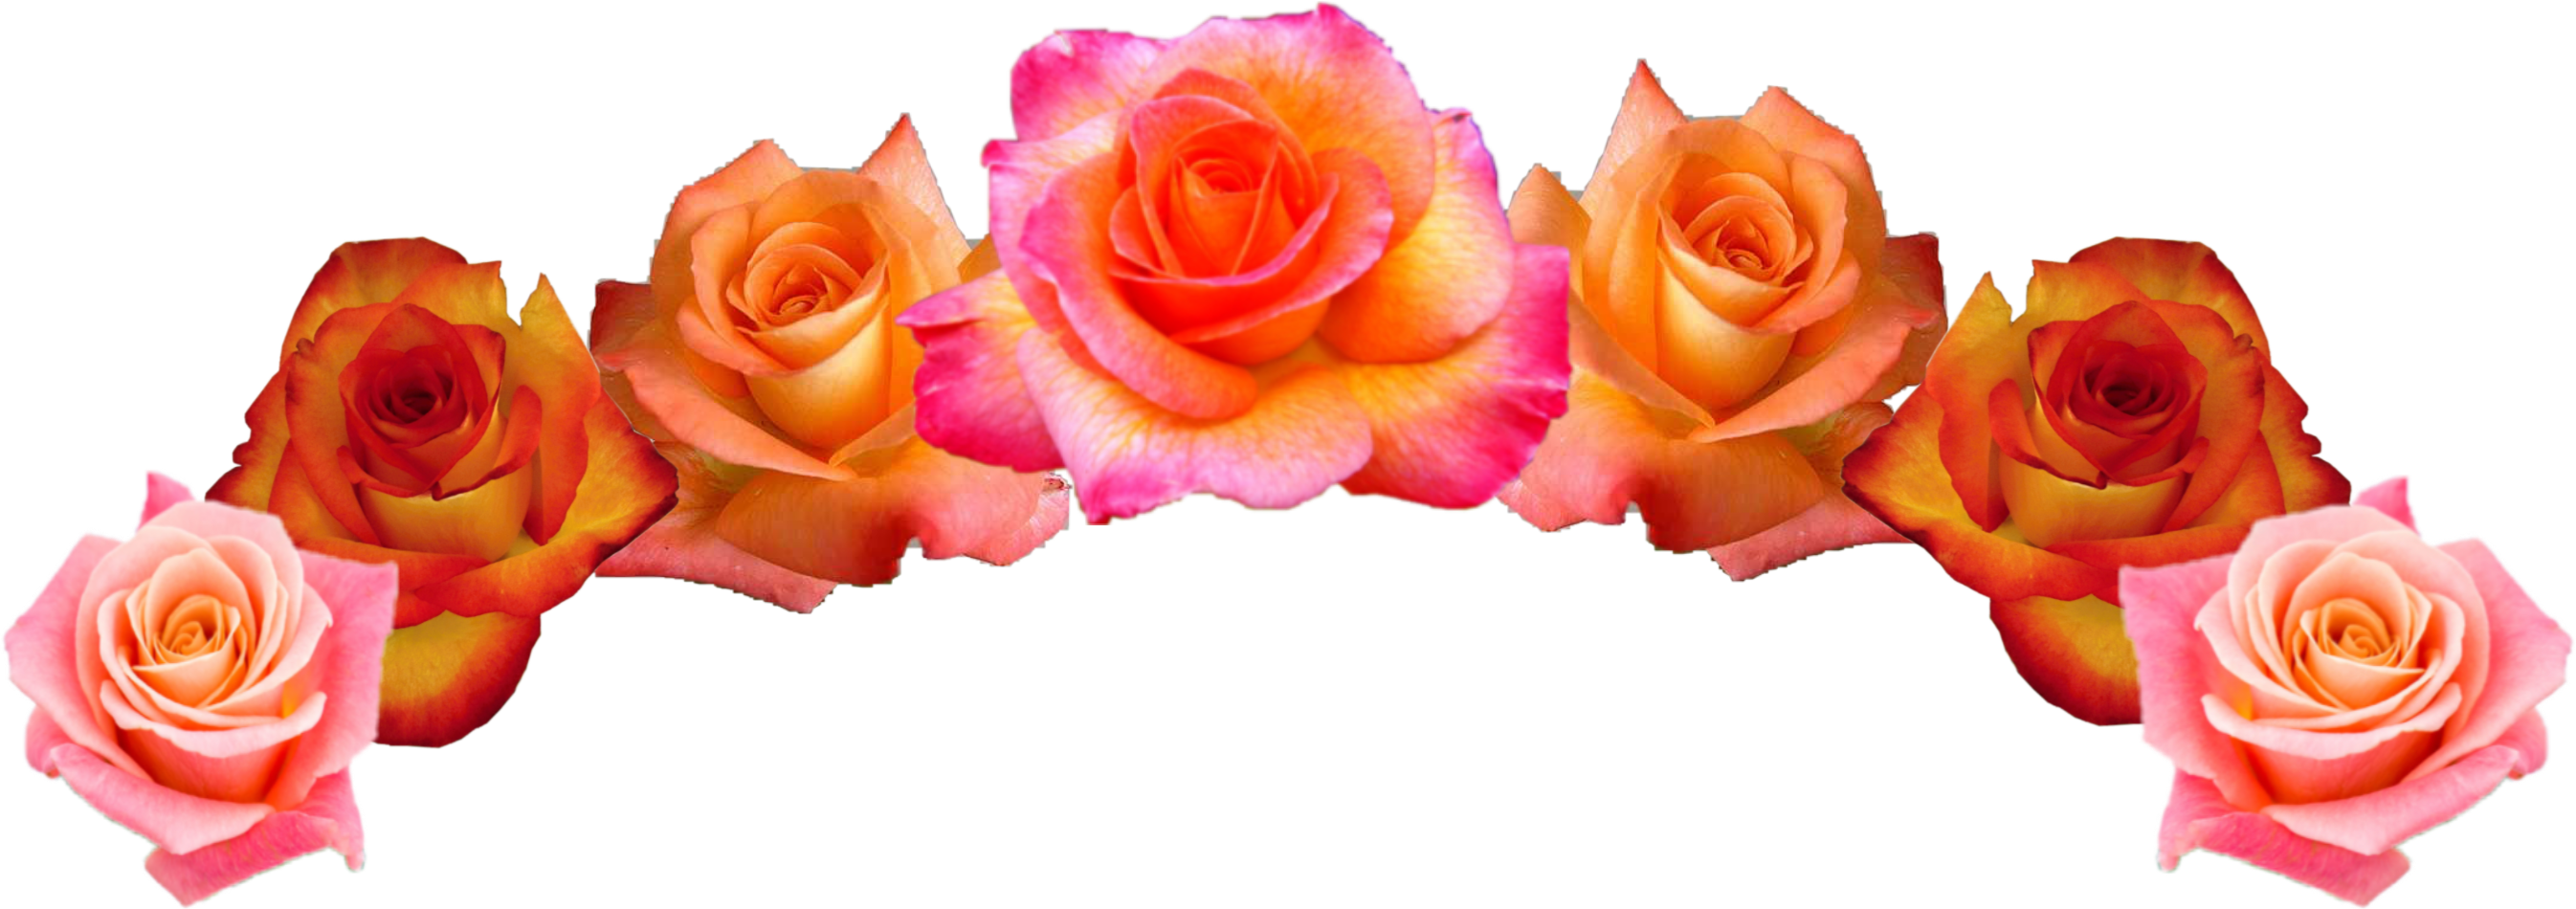 Flowercrown Flower Crown Headpiece Headband Pretty Rose Roses Beautiful Freetoedit Remixit Flower Crown Headpiece Flowers Rose